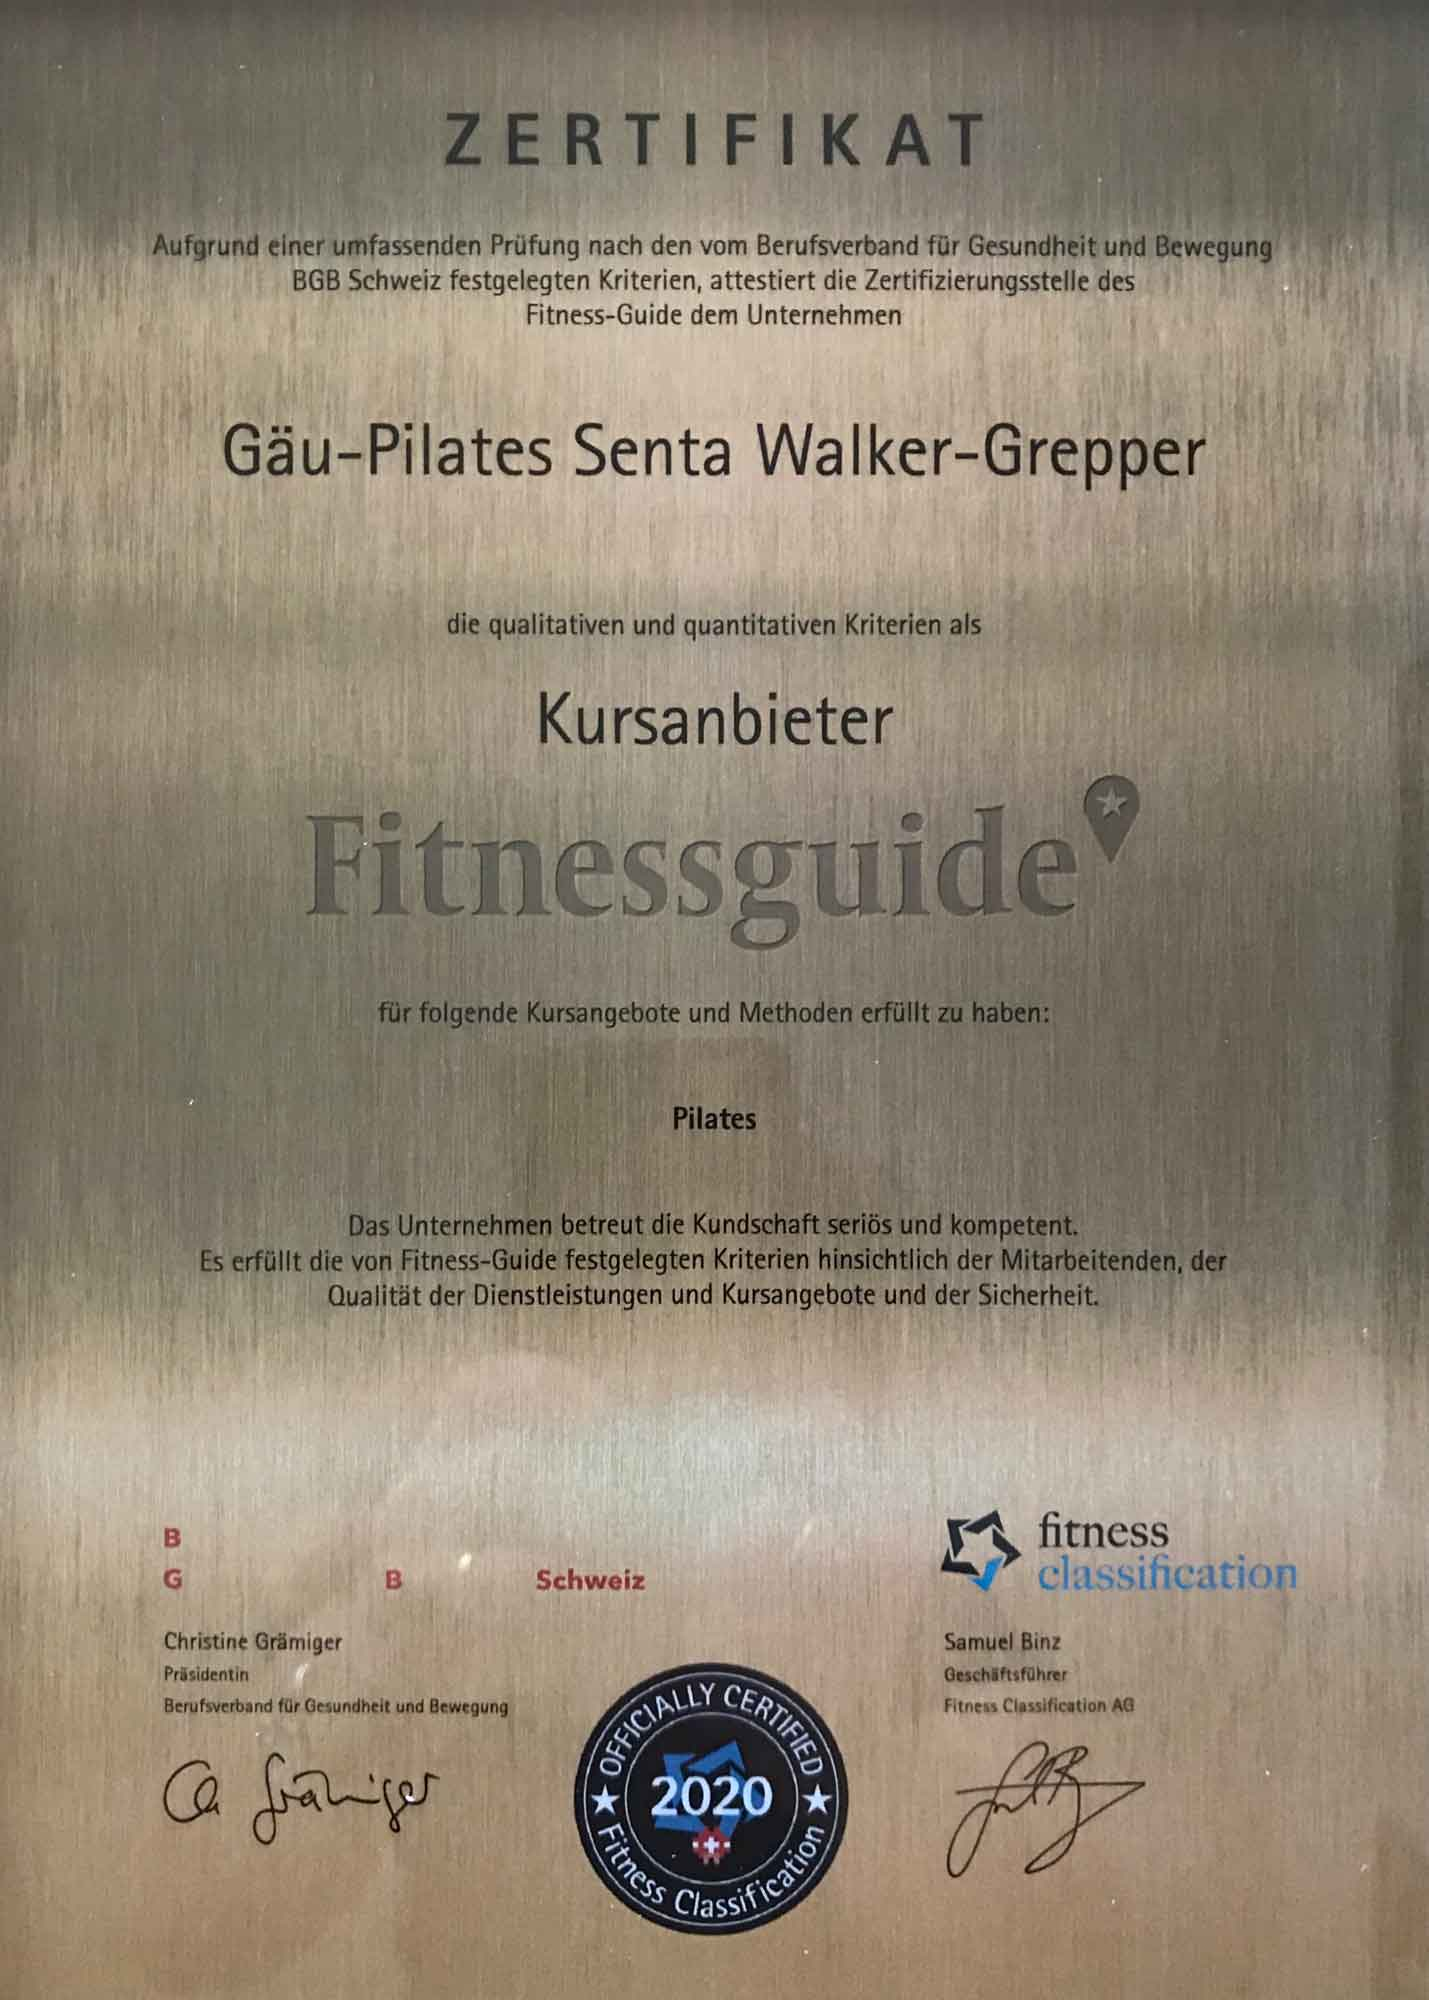 Zertifikat Pilates art2flow Senta Walker-Grepper